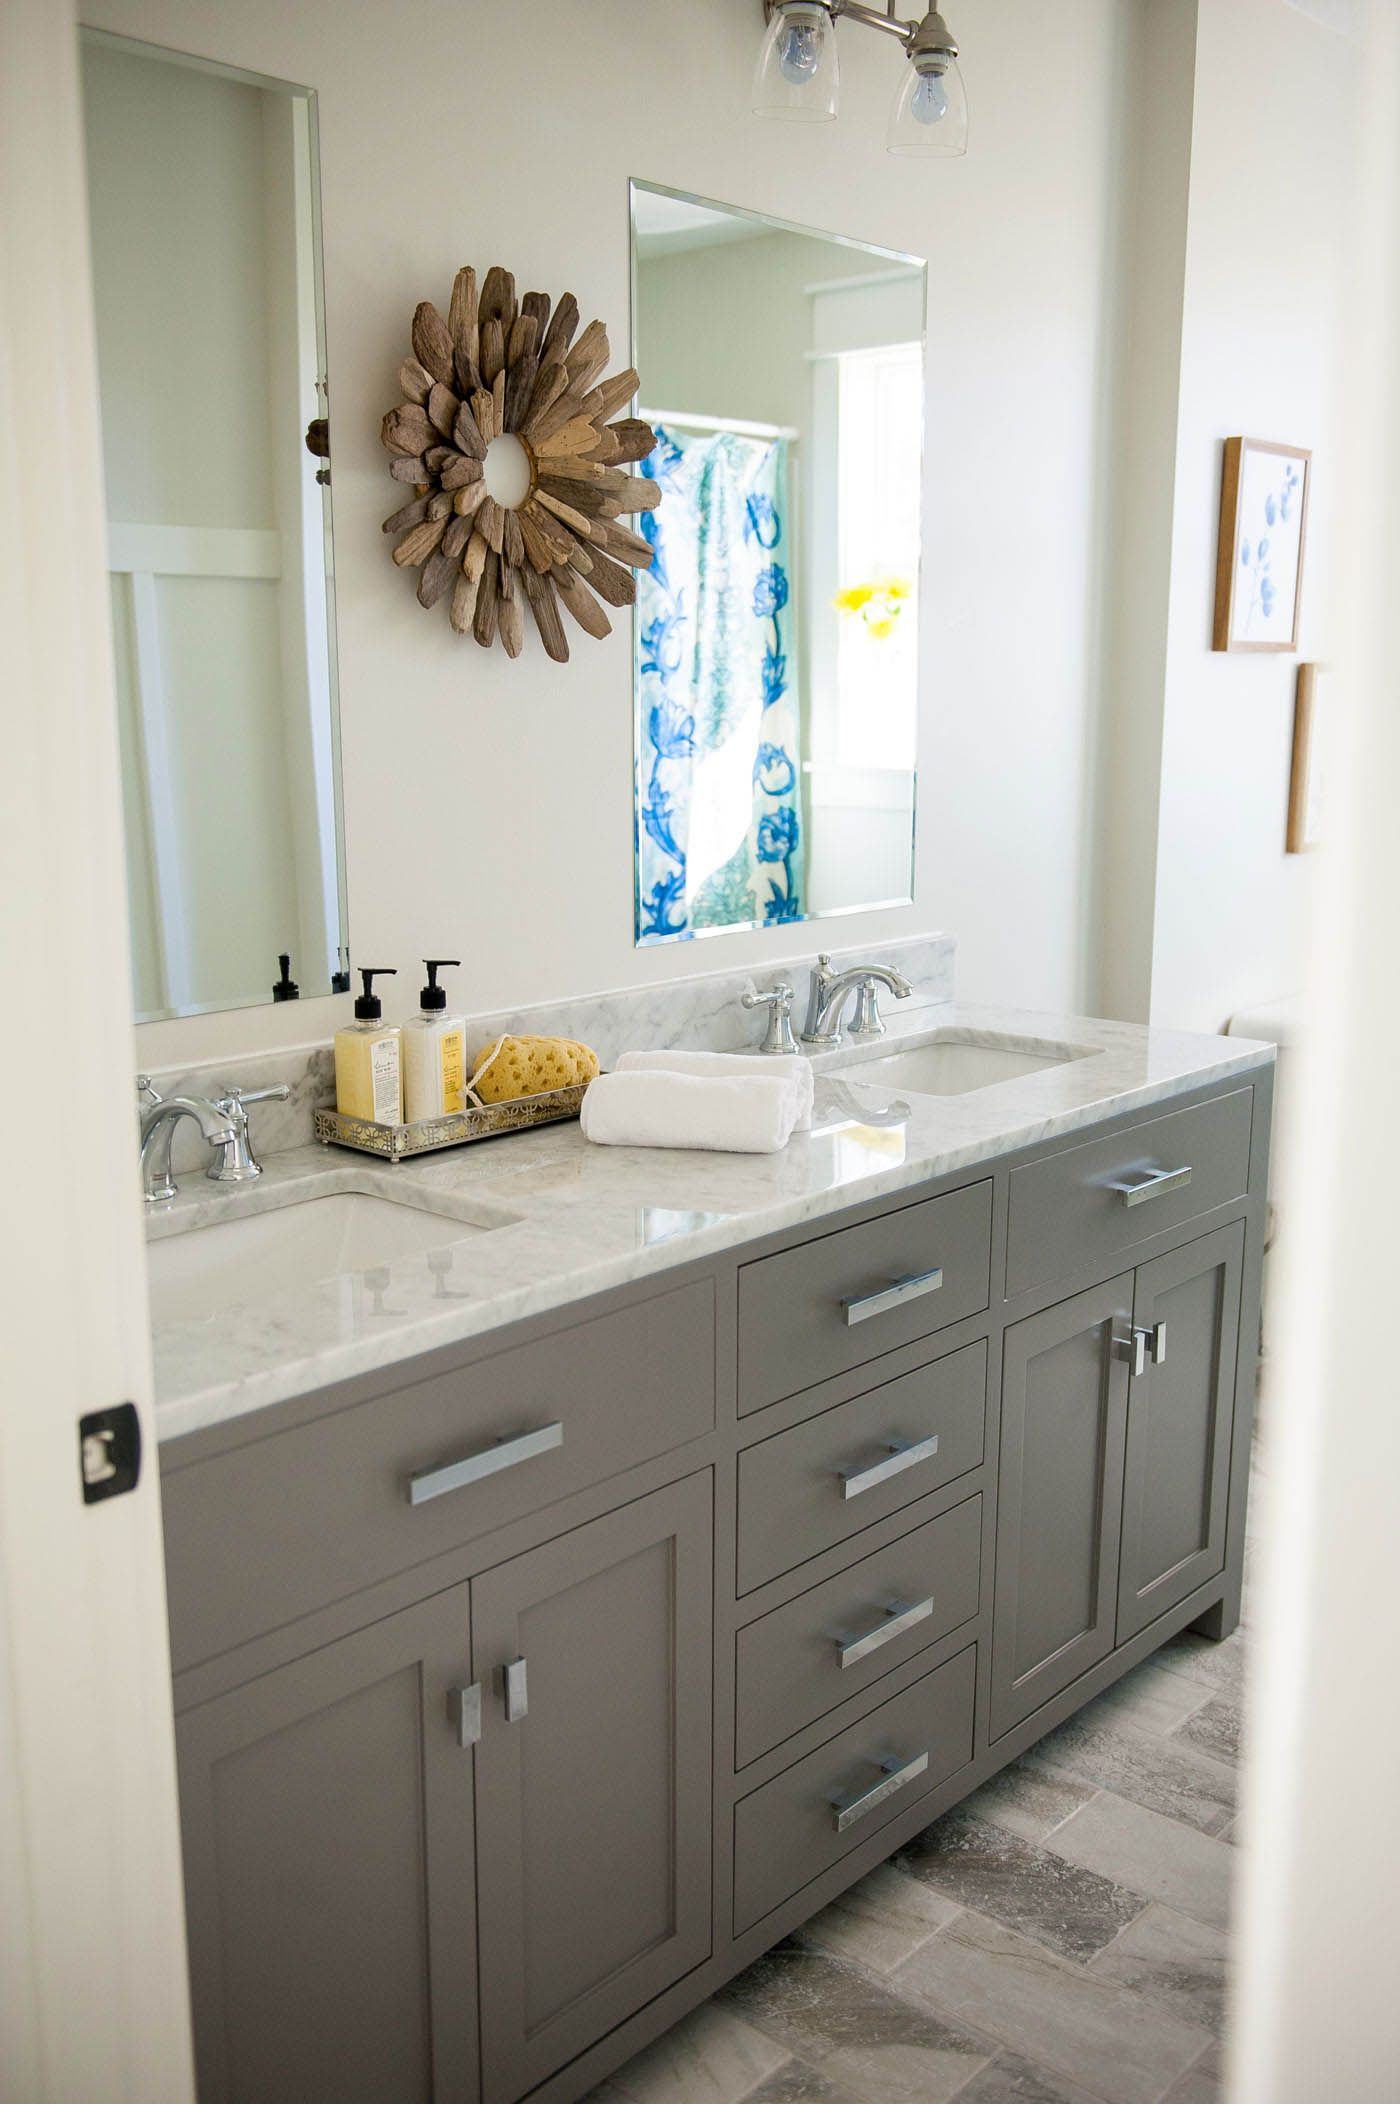 Double Sink Vanity Bathroom Designs Home Decor Ideas In 2020 Double Vanity Bathroom Master Bathroom Vanity Grey Bathroom Vanity